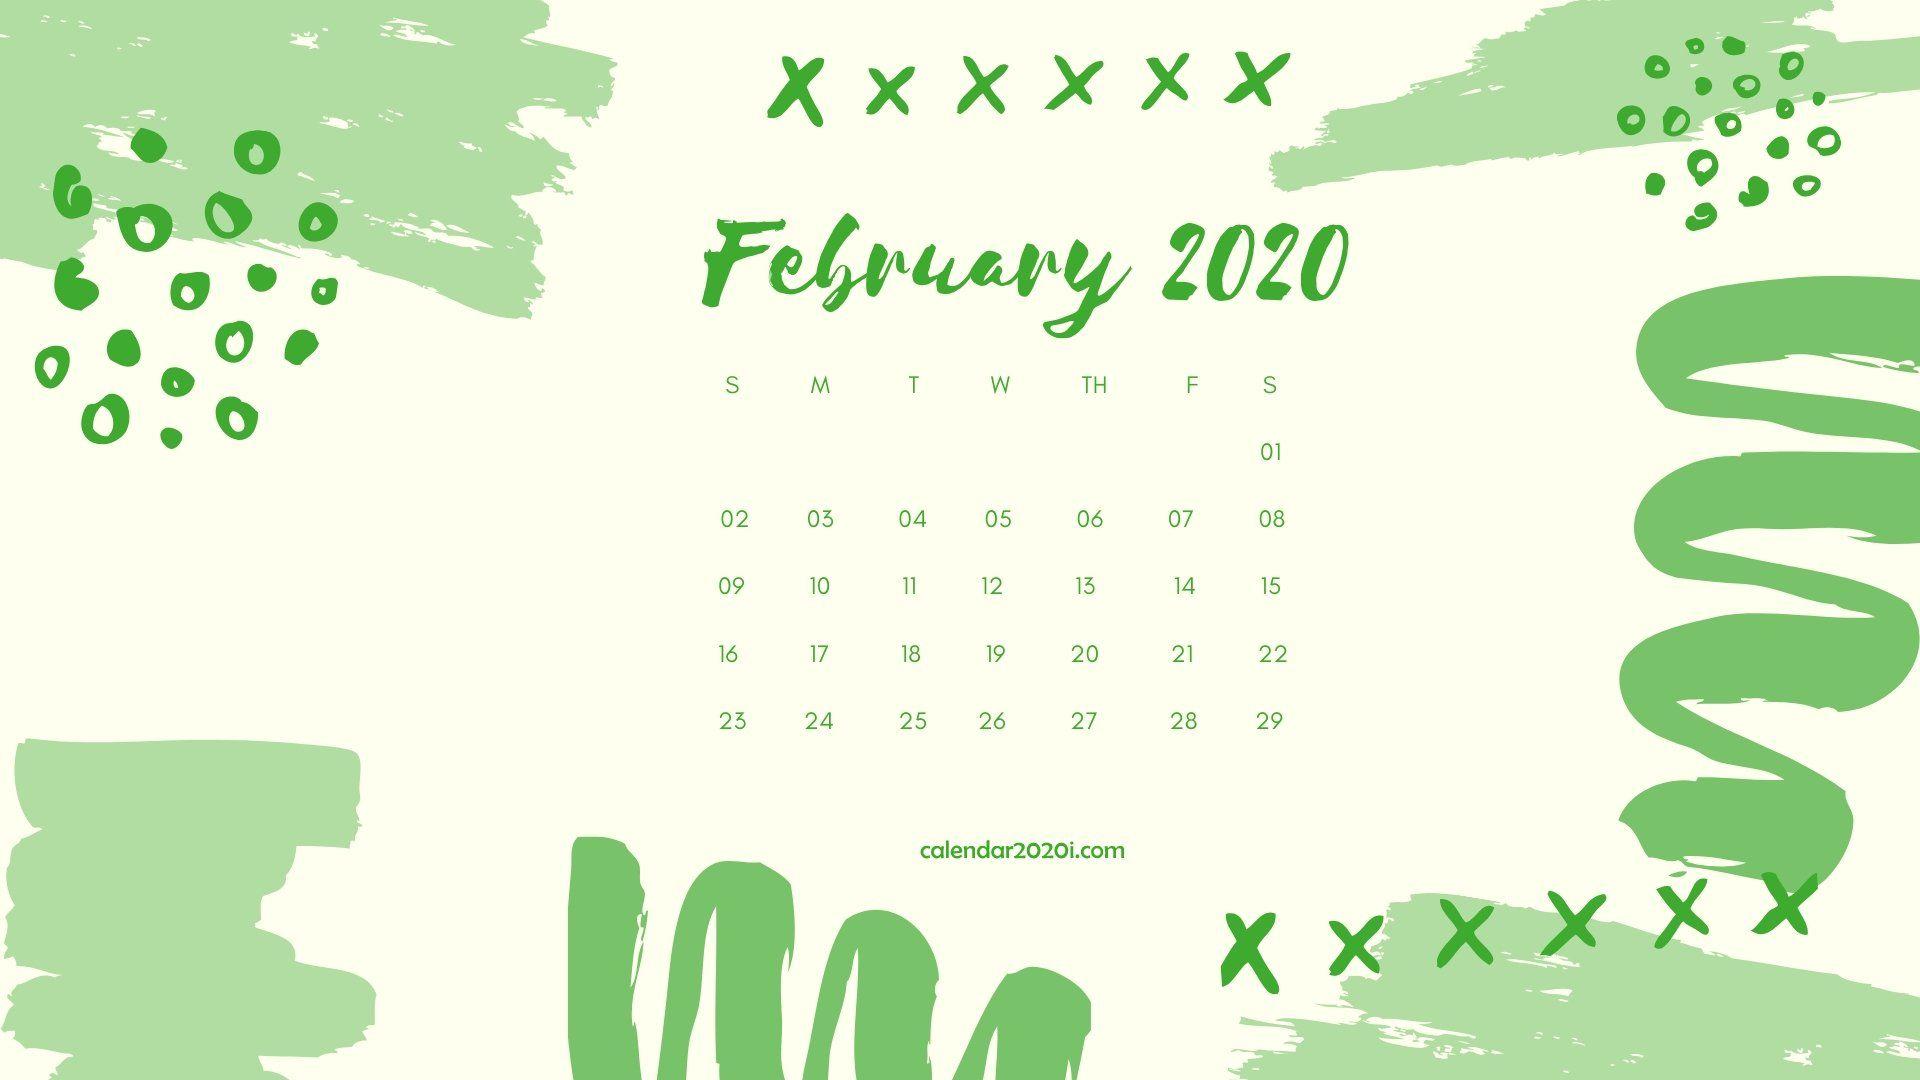 February 2020 Calendar Desktop Wallpaper January calendar July 1920x1080